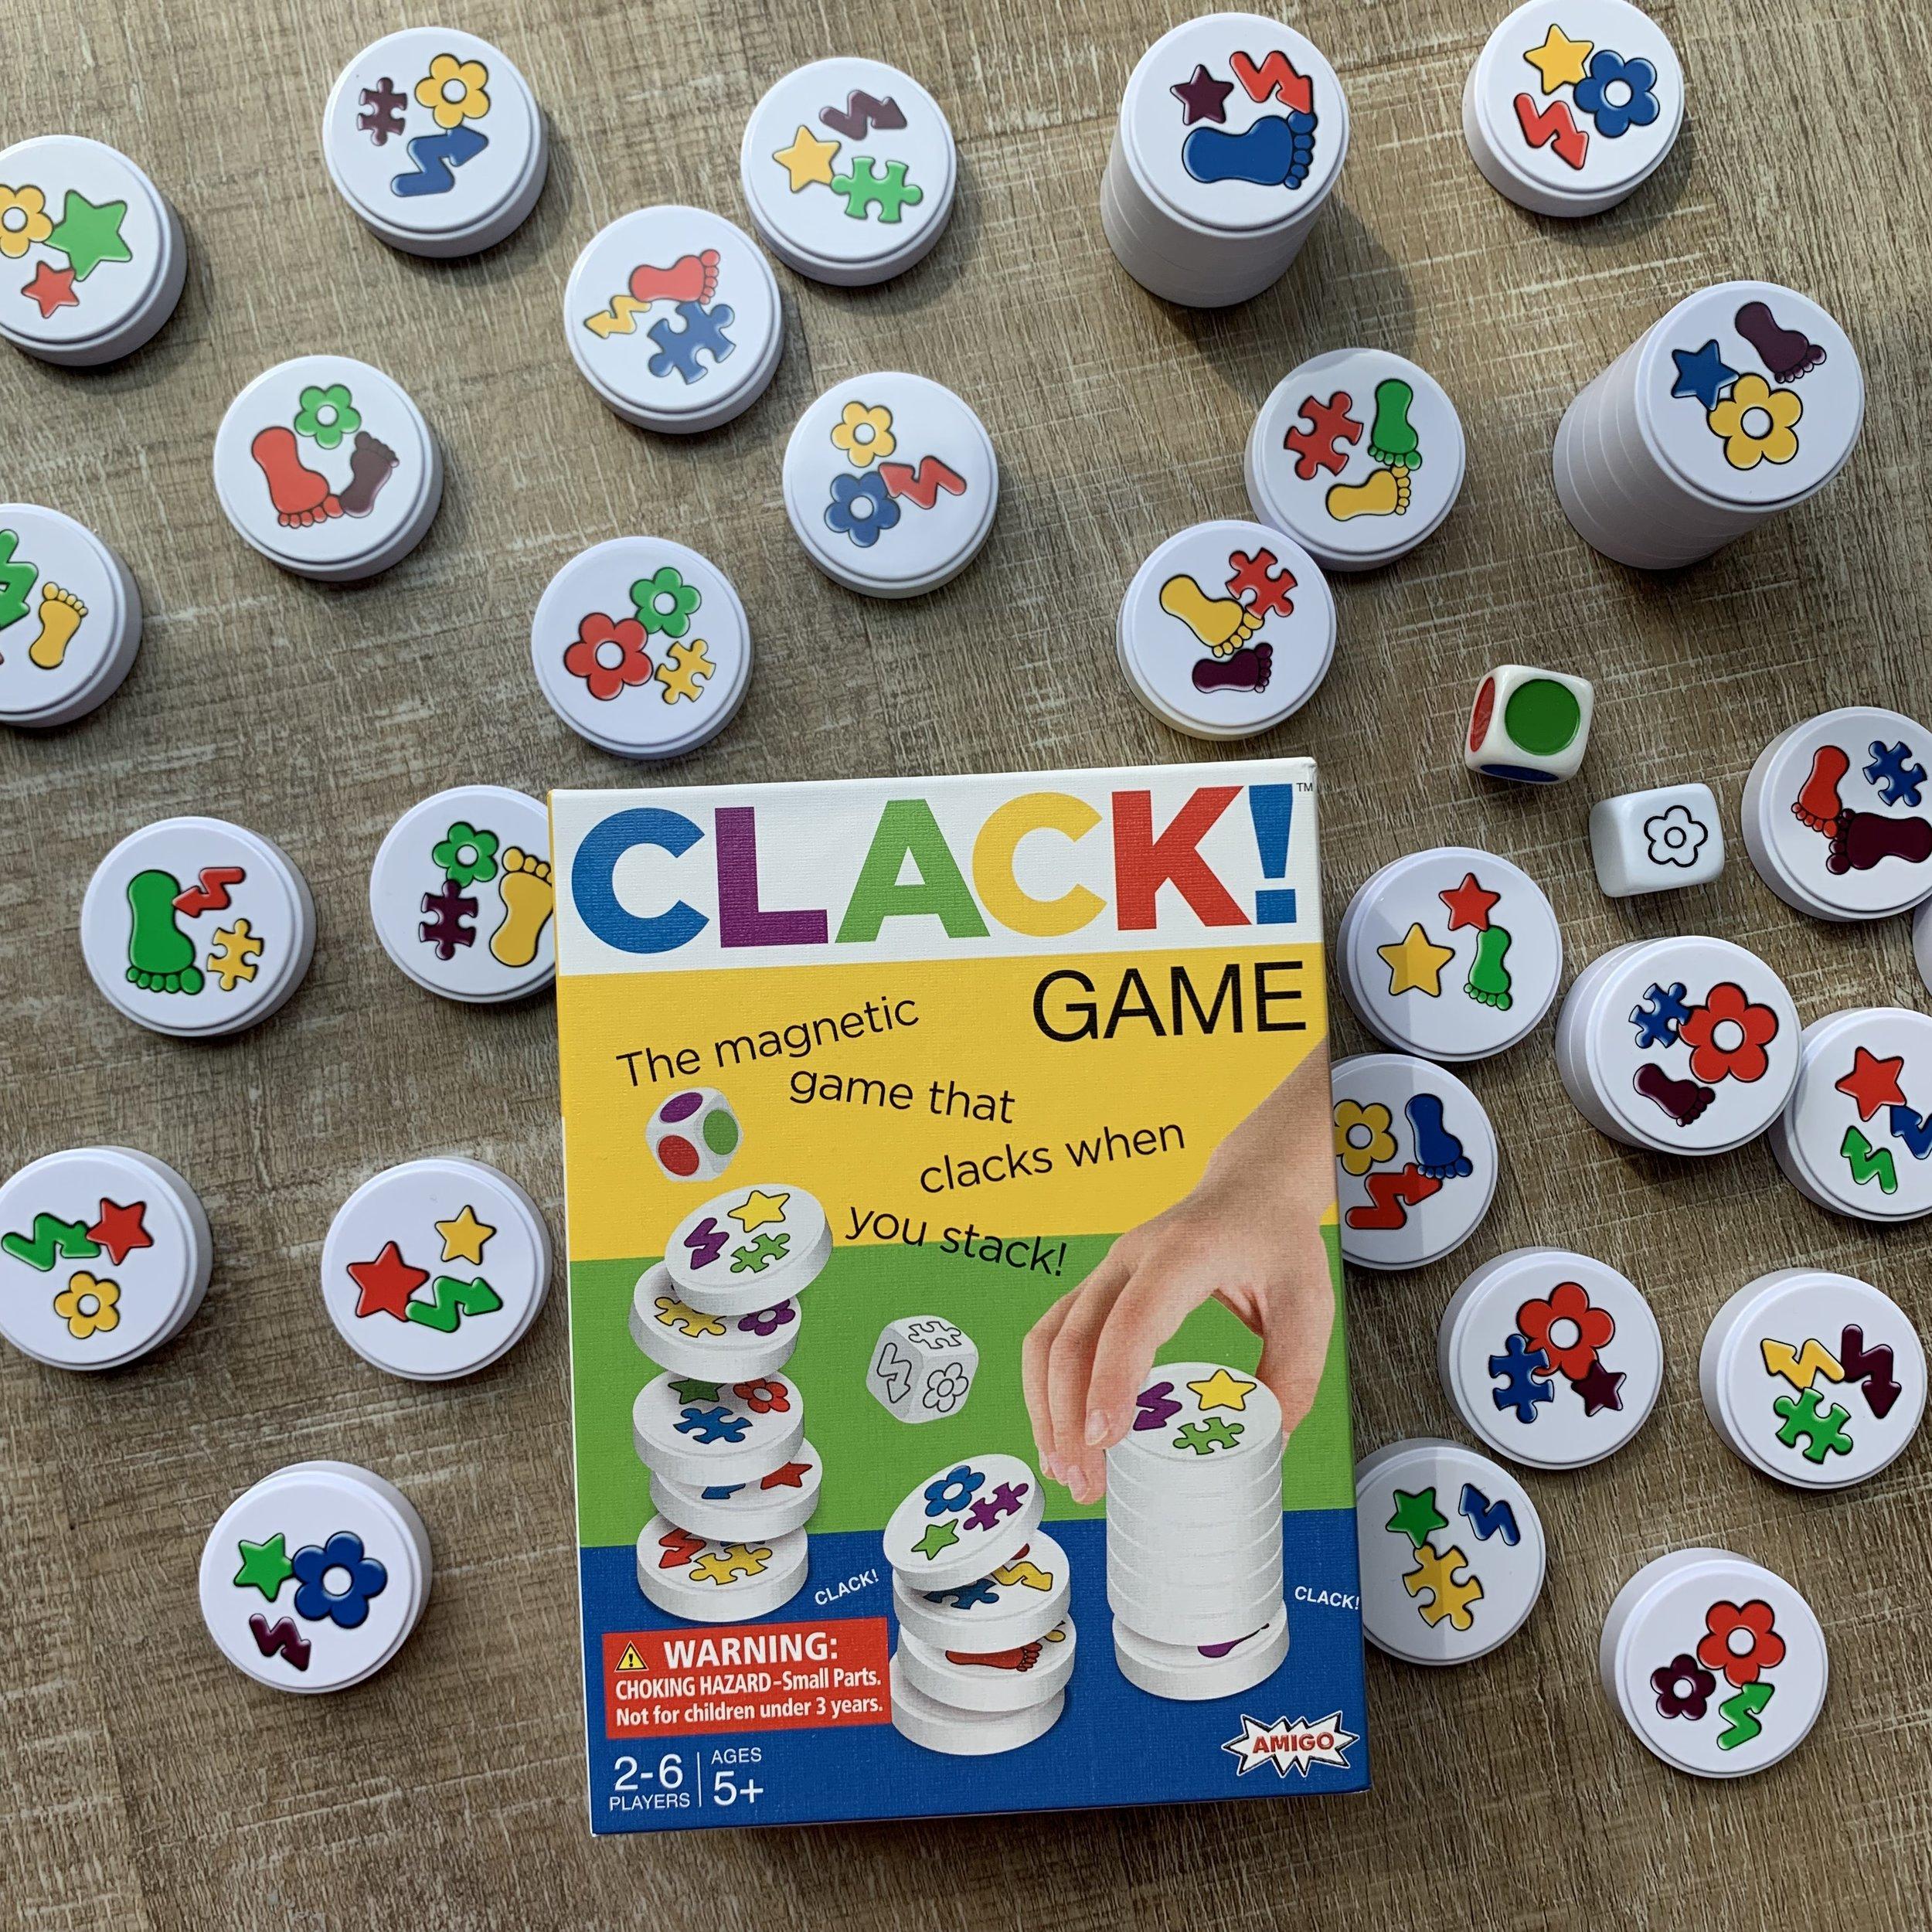 Clack1.jpg